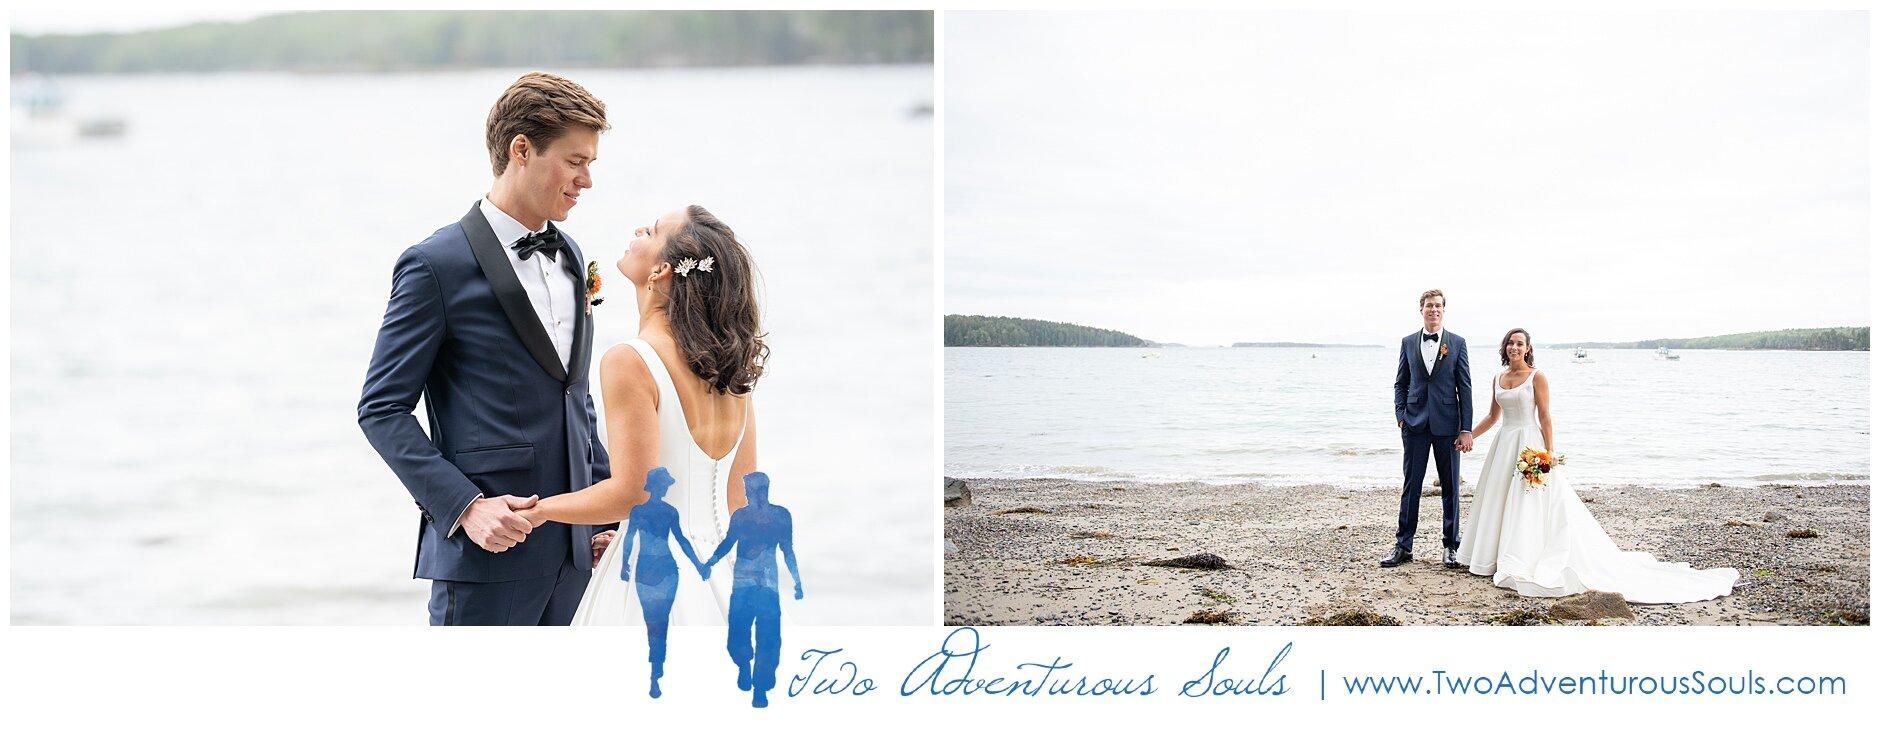 Bar Harbor Wedding Photographers, Acadia Bay Inn Wedding Photographers, Two Adventurous Souls- 091419_0013.jpg